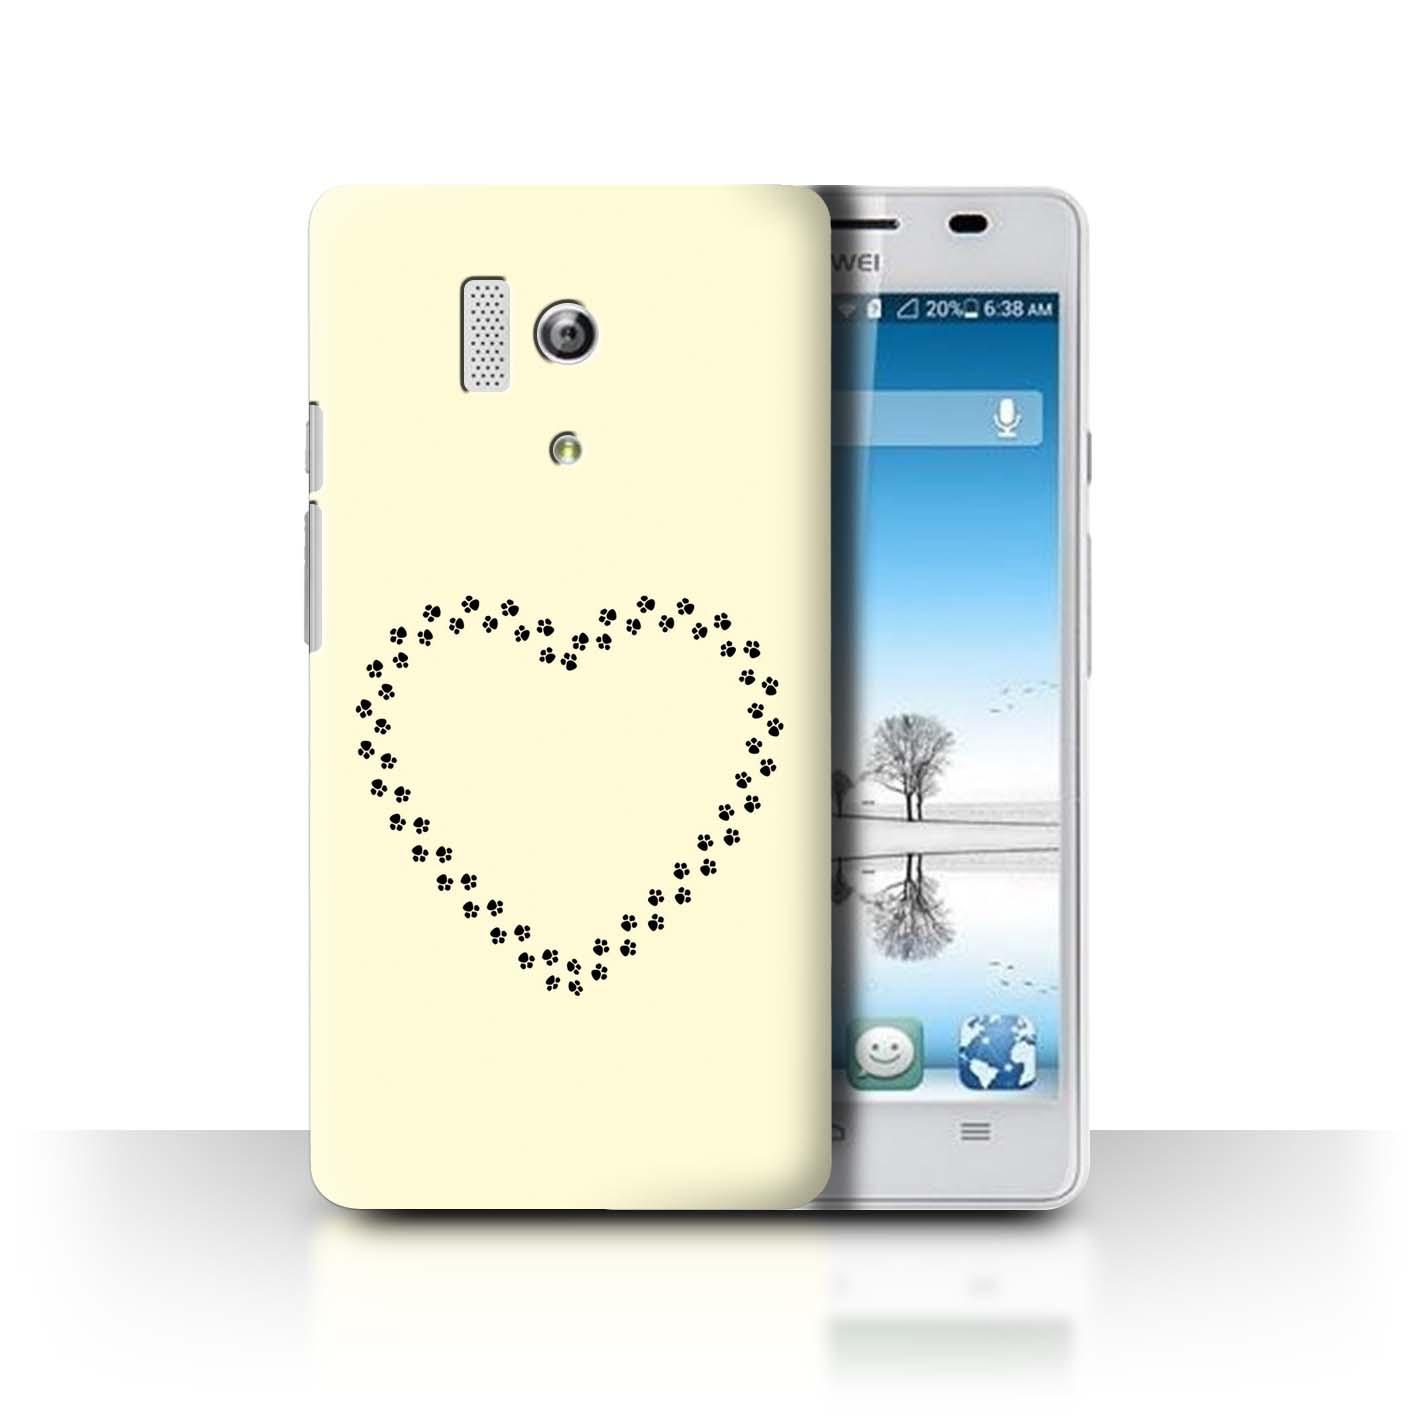 STUFF4-Back-Case-Cover-Skin-for-Huawei-Honor-3-Cute-Cartoon-Cat